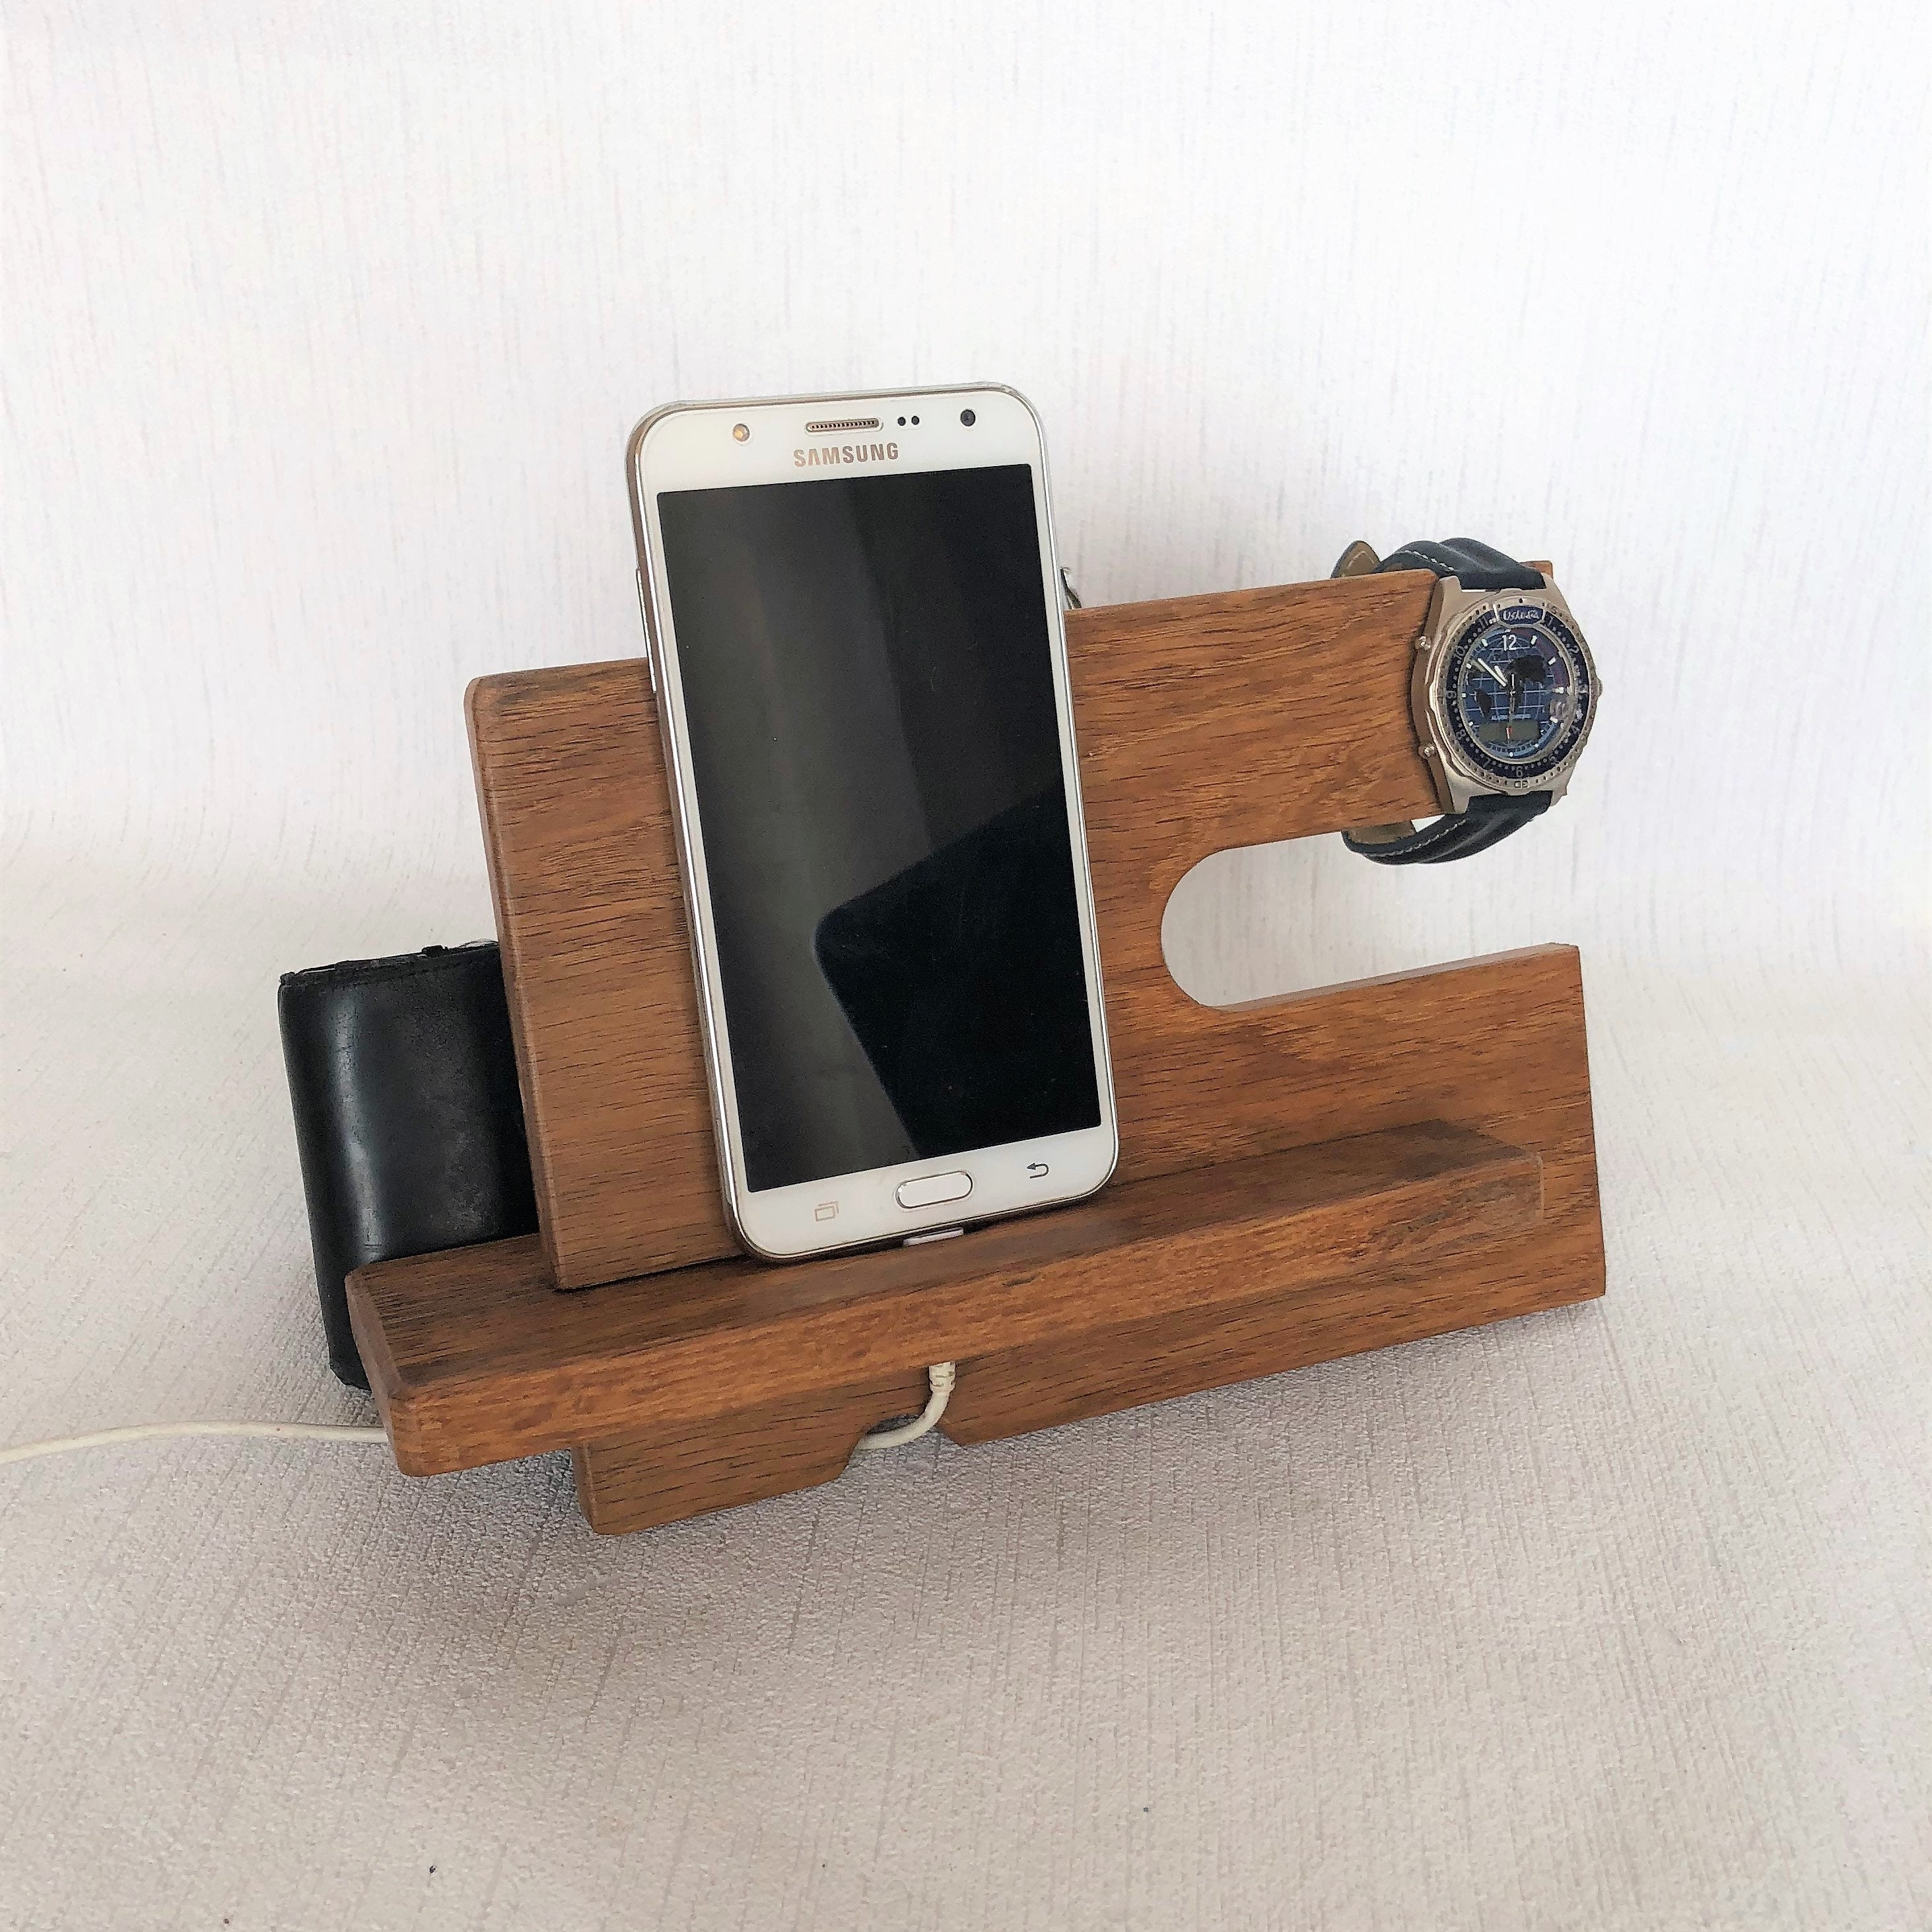 Oak Wood Phone Docking Station Tech Gift Men Android Charging Station Mens Valet Nightstand Organizer Bedside Organizer Wallet Watch Holder